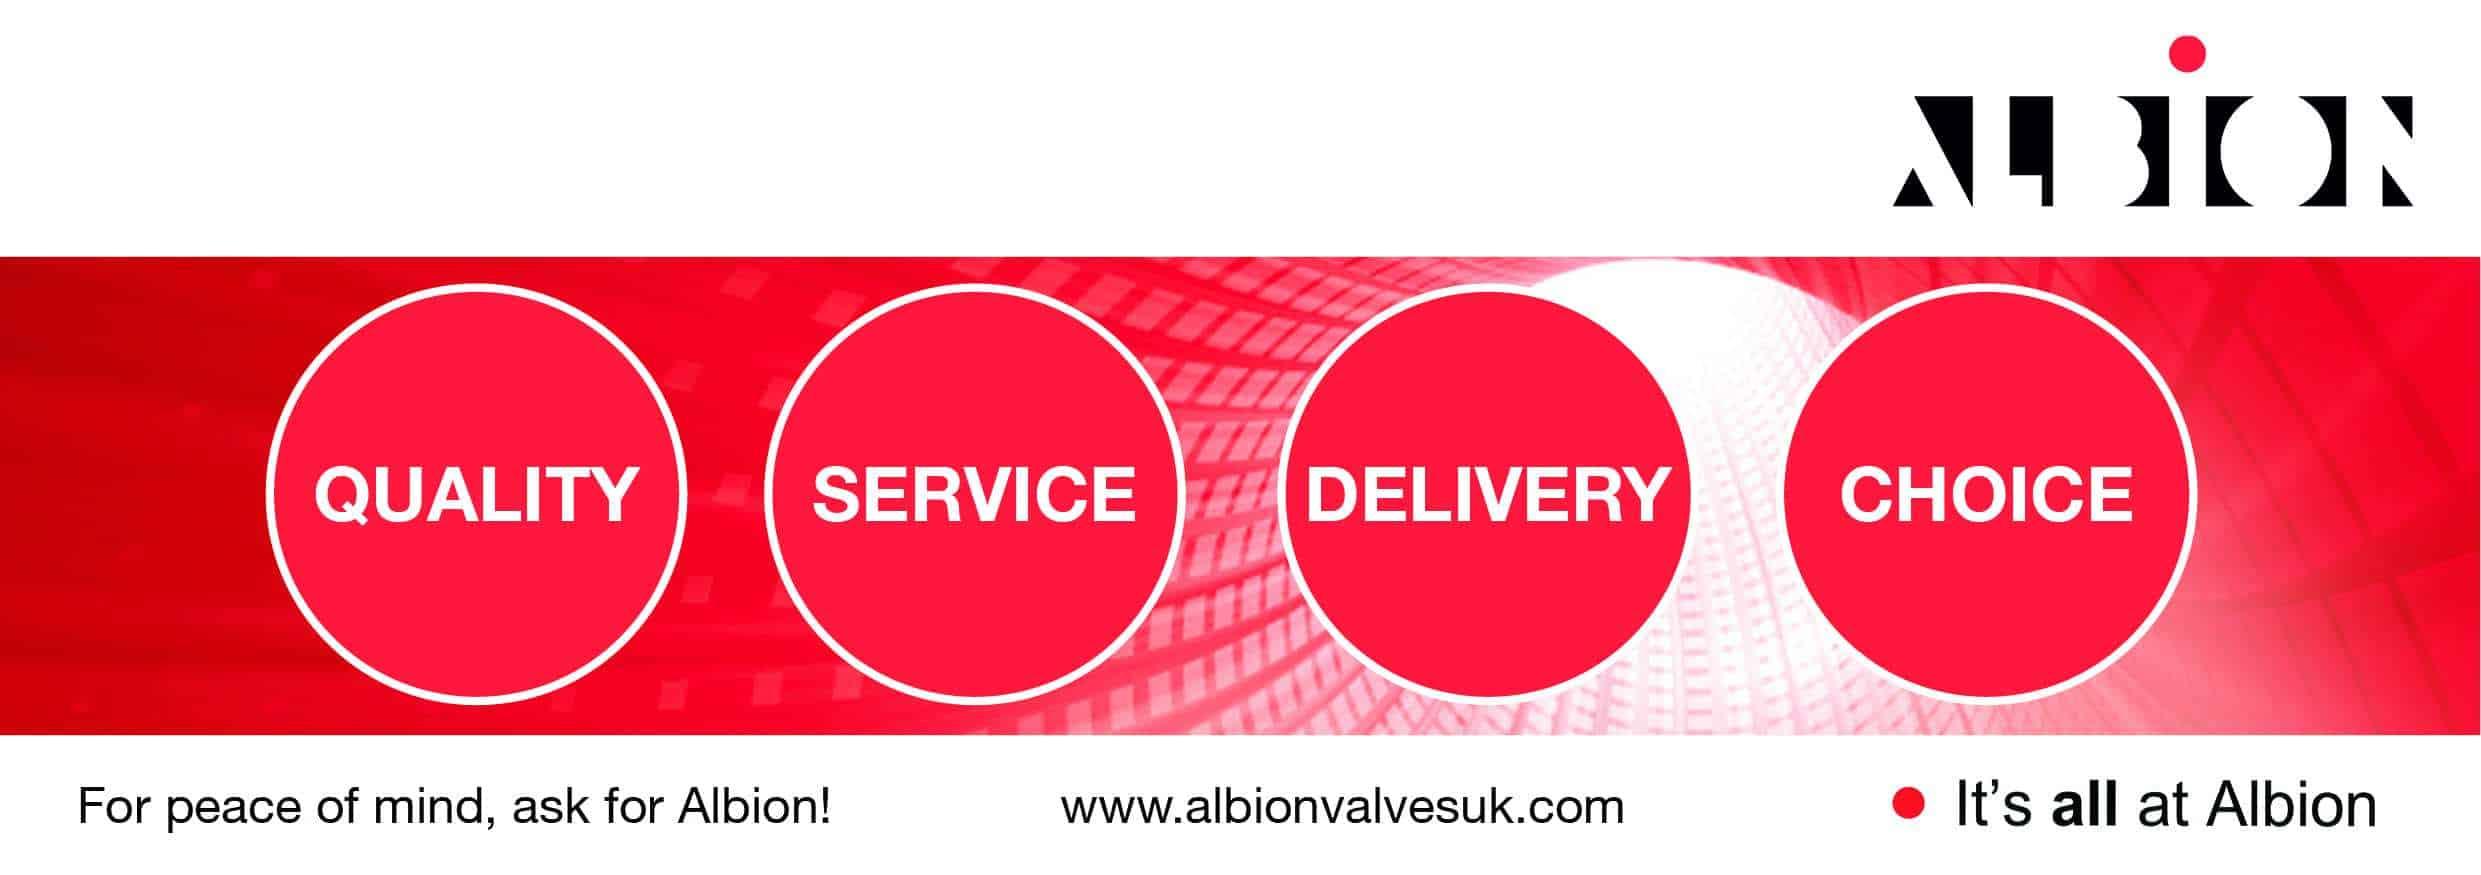 Albion Valves Image